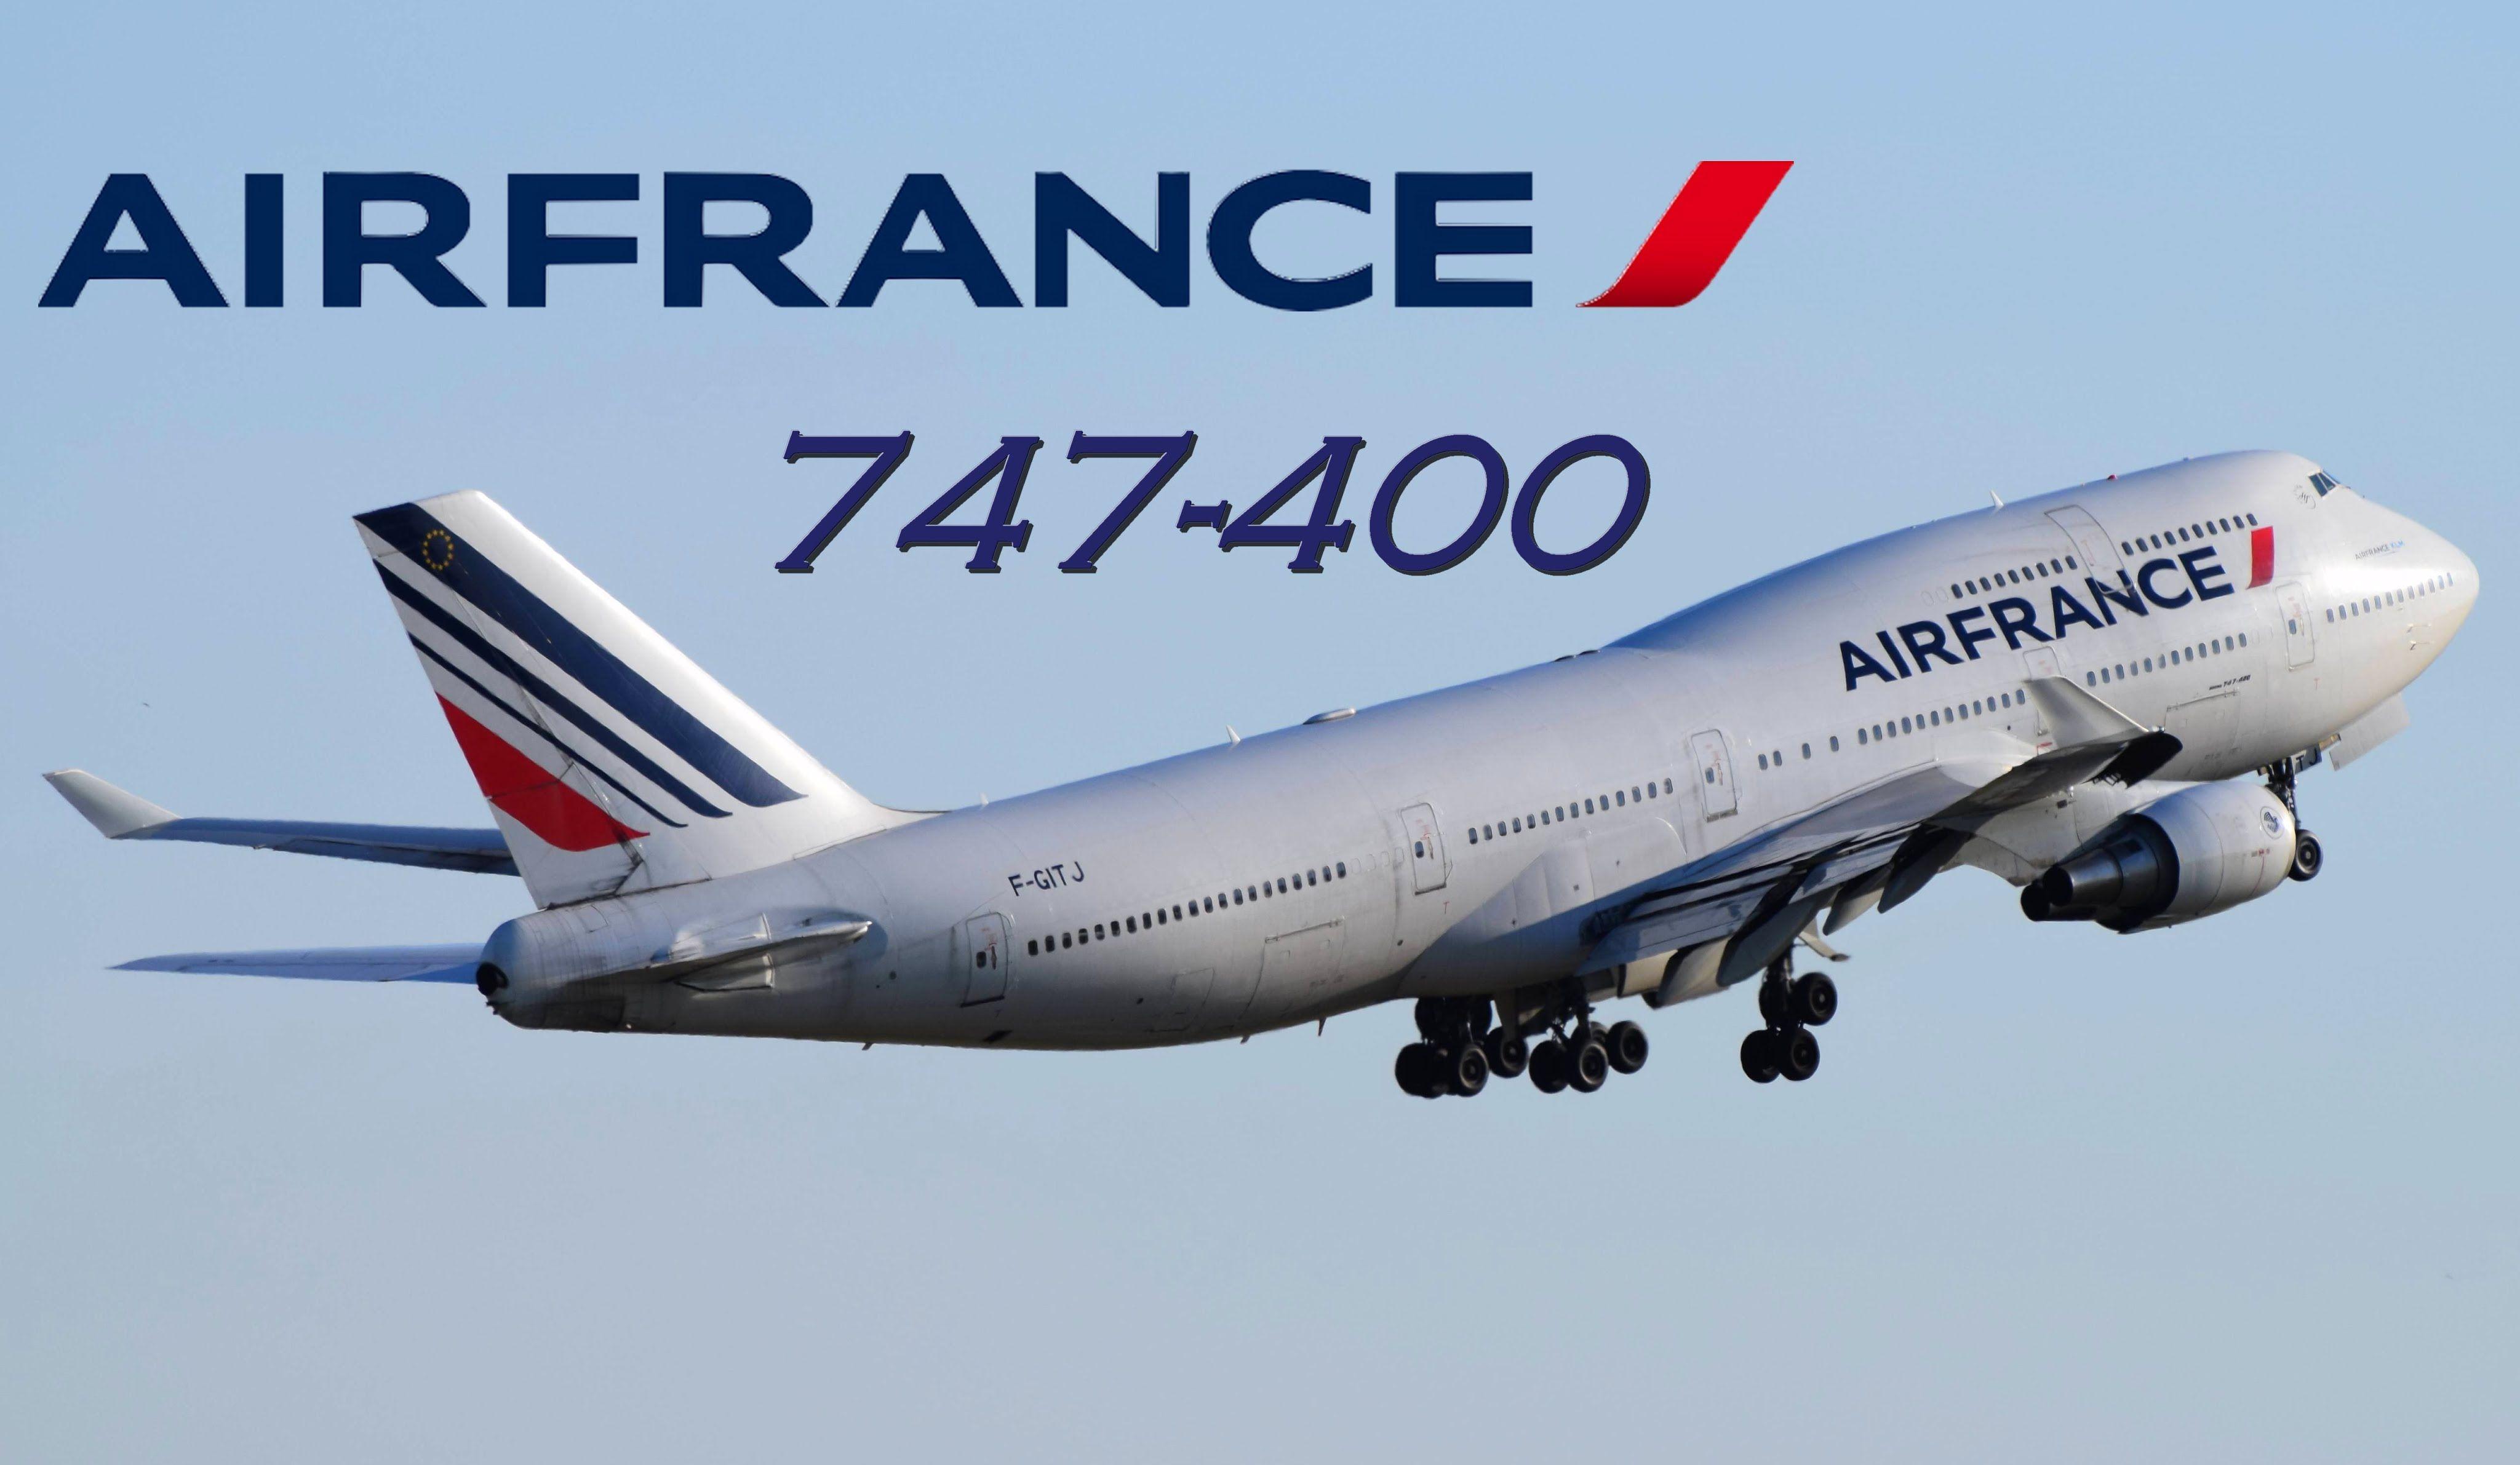 Farewell Air France Boeing 747 Youtube Air France Boeing 747 Boeing Aircraft